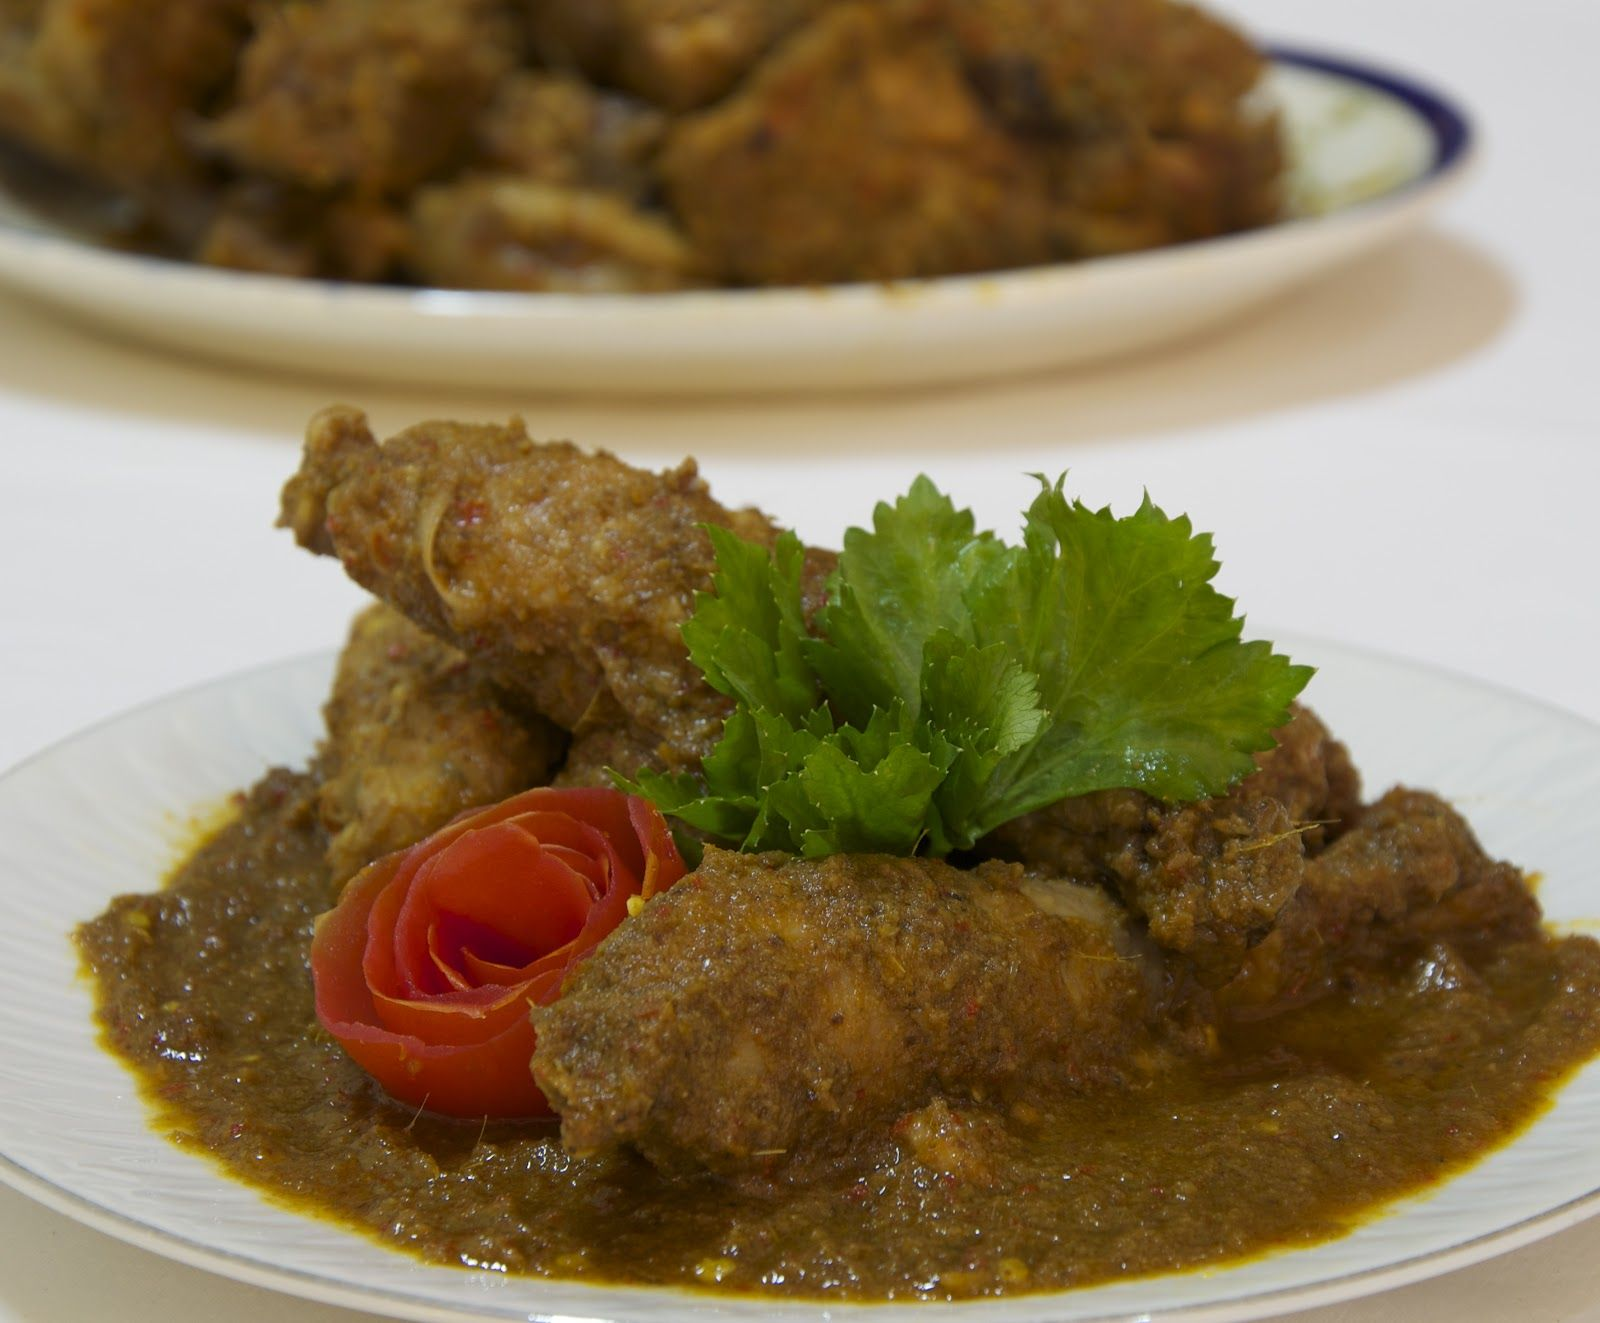 Indonesian medan food ayam pinadar batak style chicken indonesian medan food ayam pinadar batak style chicken forumfinder Images